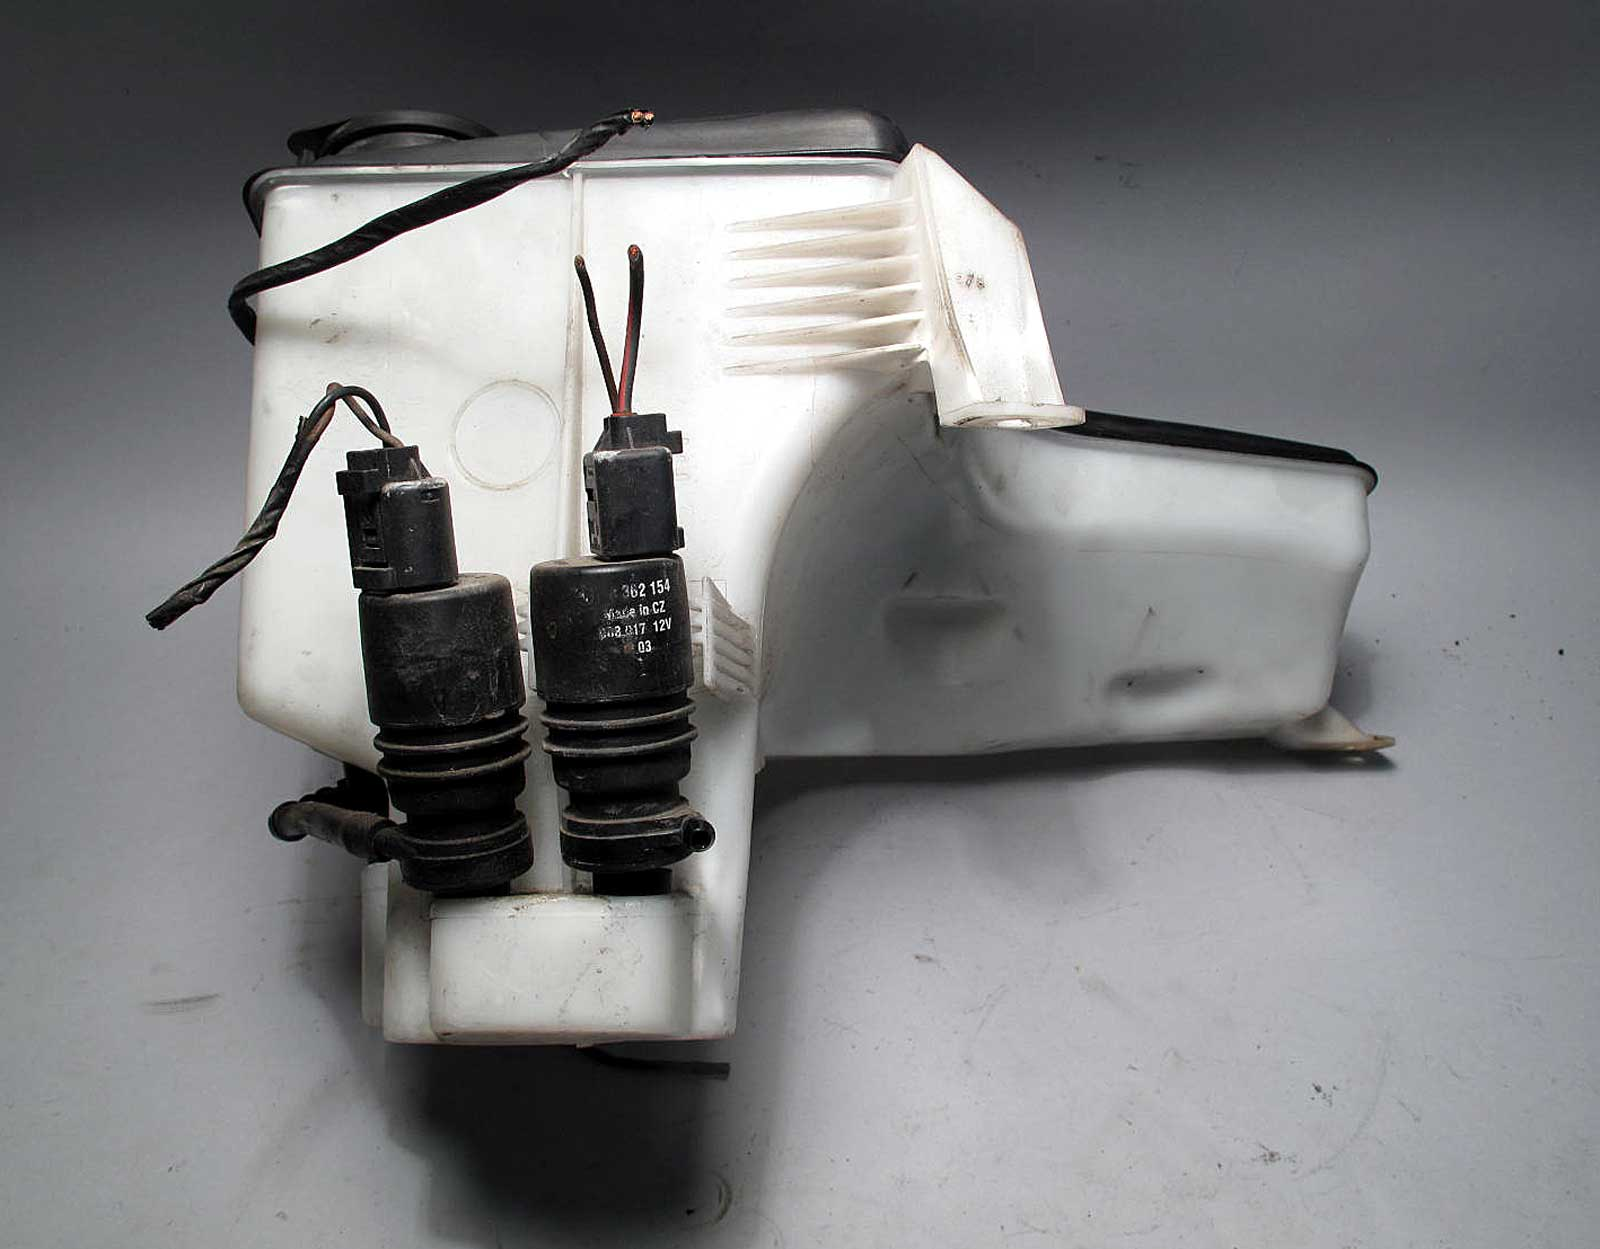 Bmw E53 X5 Sav Windshield Headlight Washer Fluid Bottle W Pumps 2000